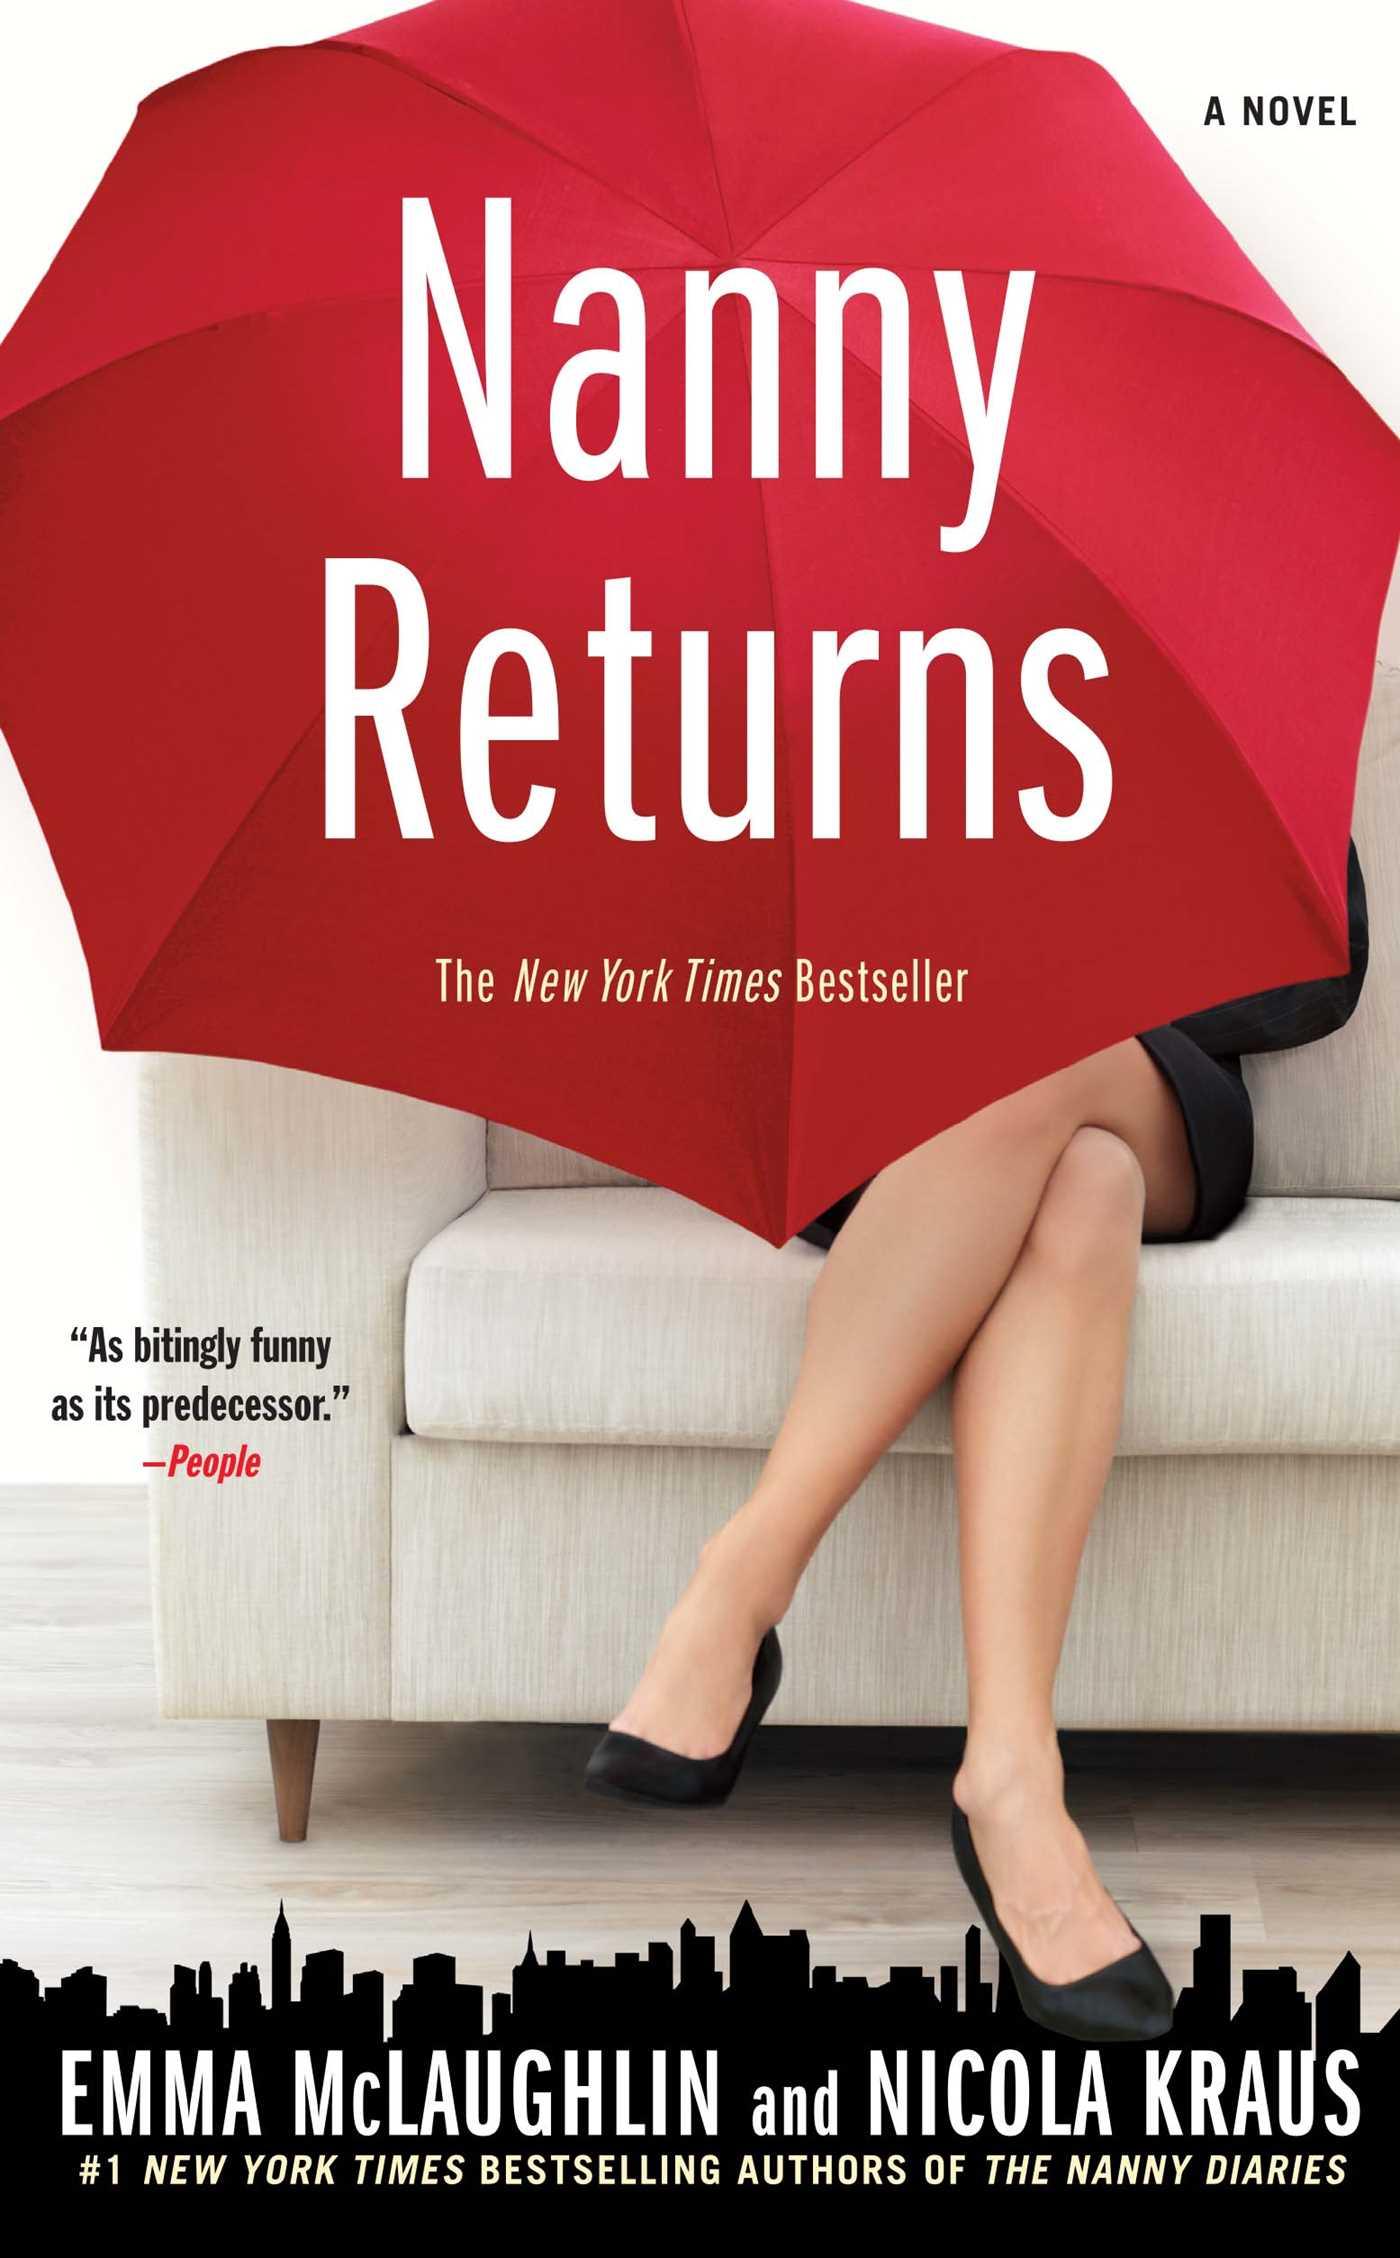 Nanny returns 9781416585688 hr